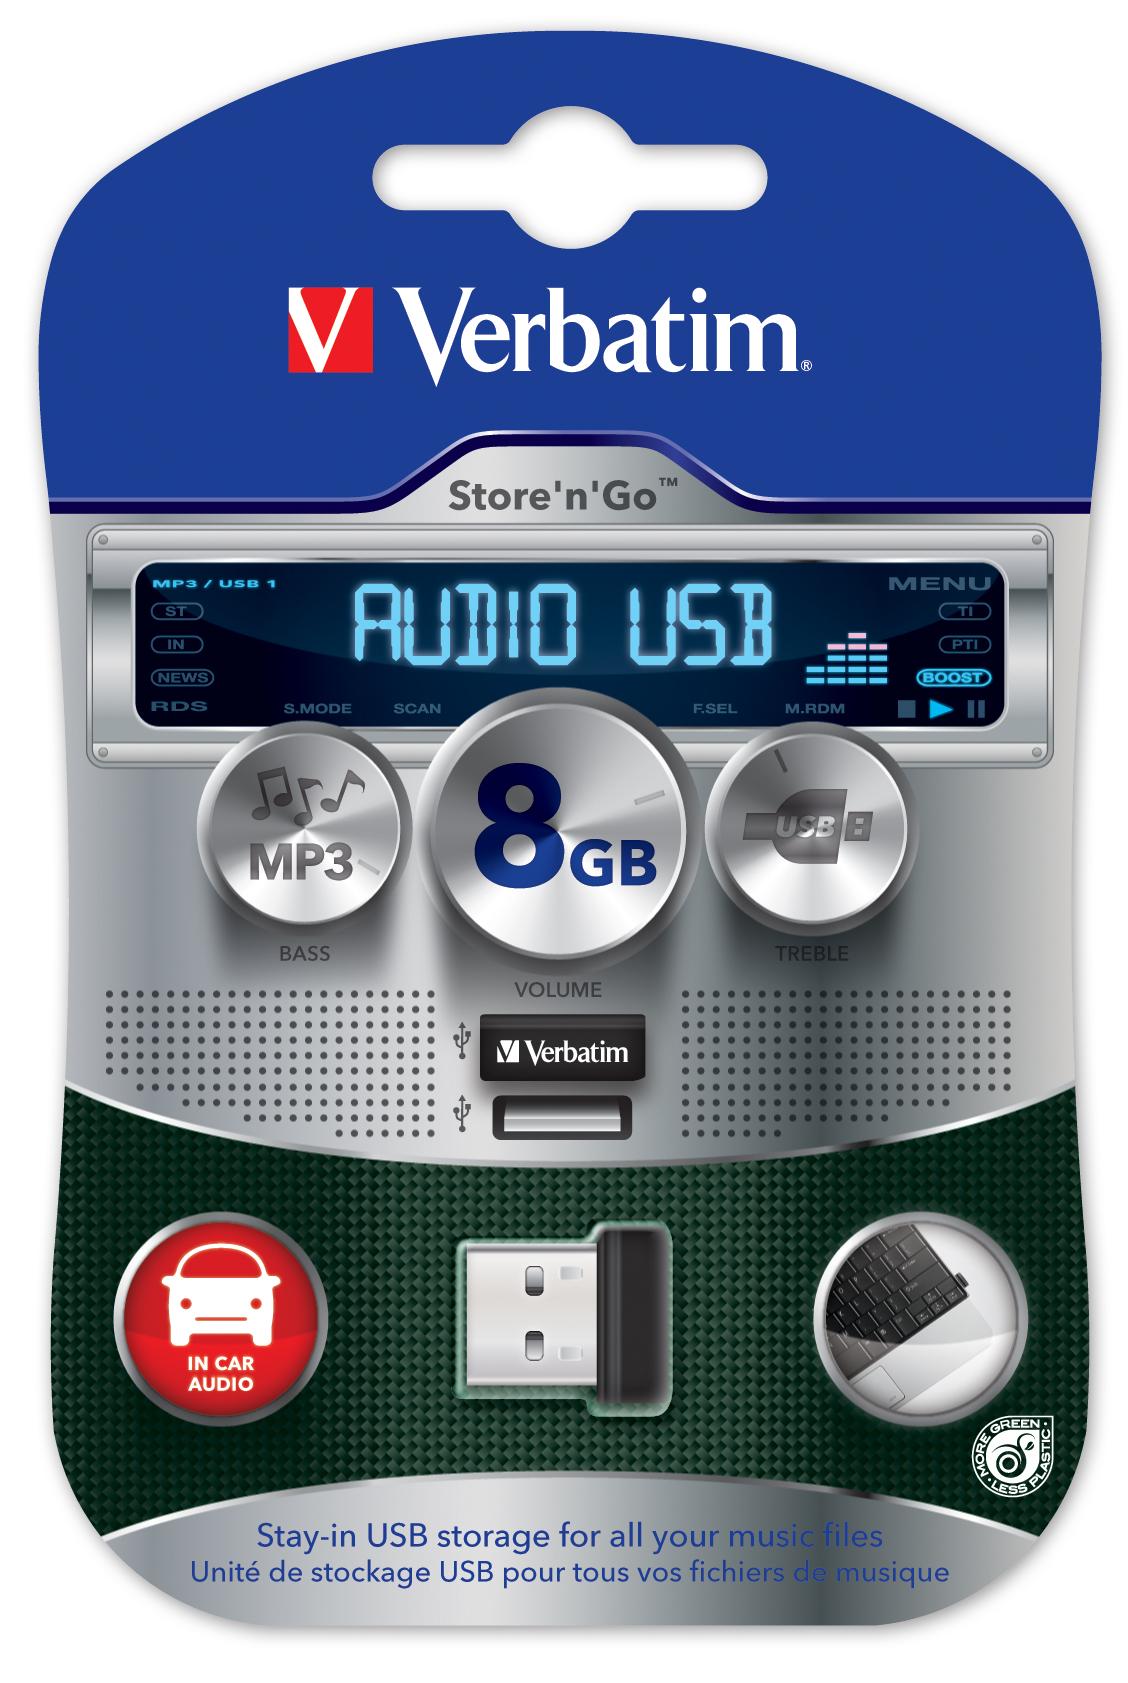 Verbatim Store 'n' Go USB Car Audio Storage